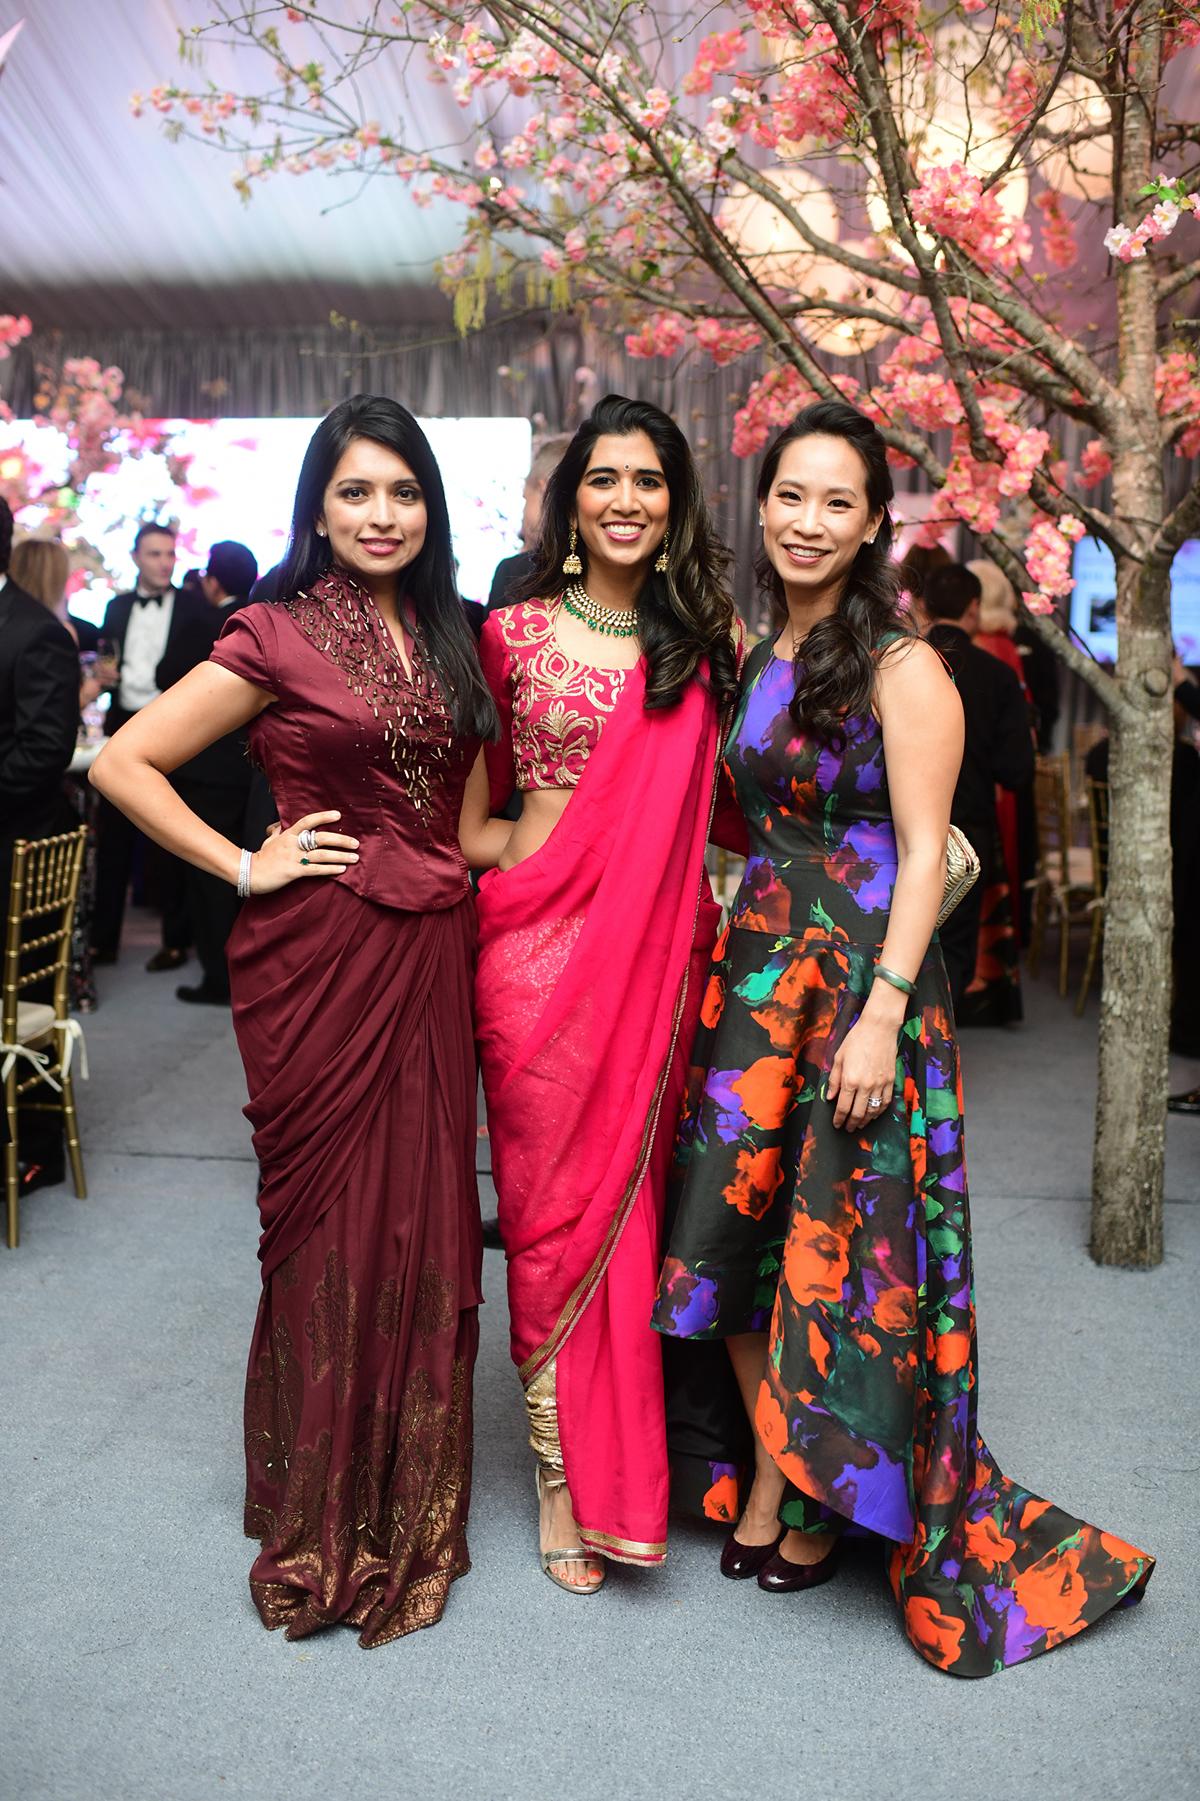 Payal Chana, Divya Brown and Janae Tsai